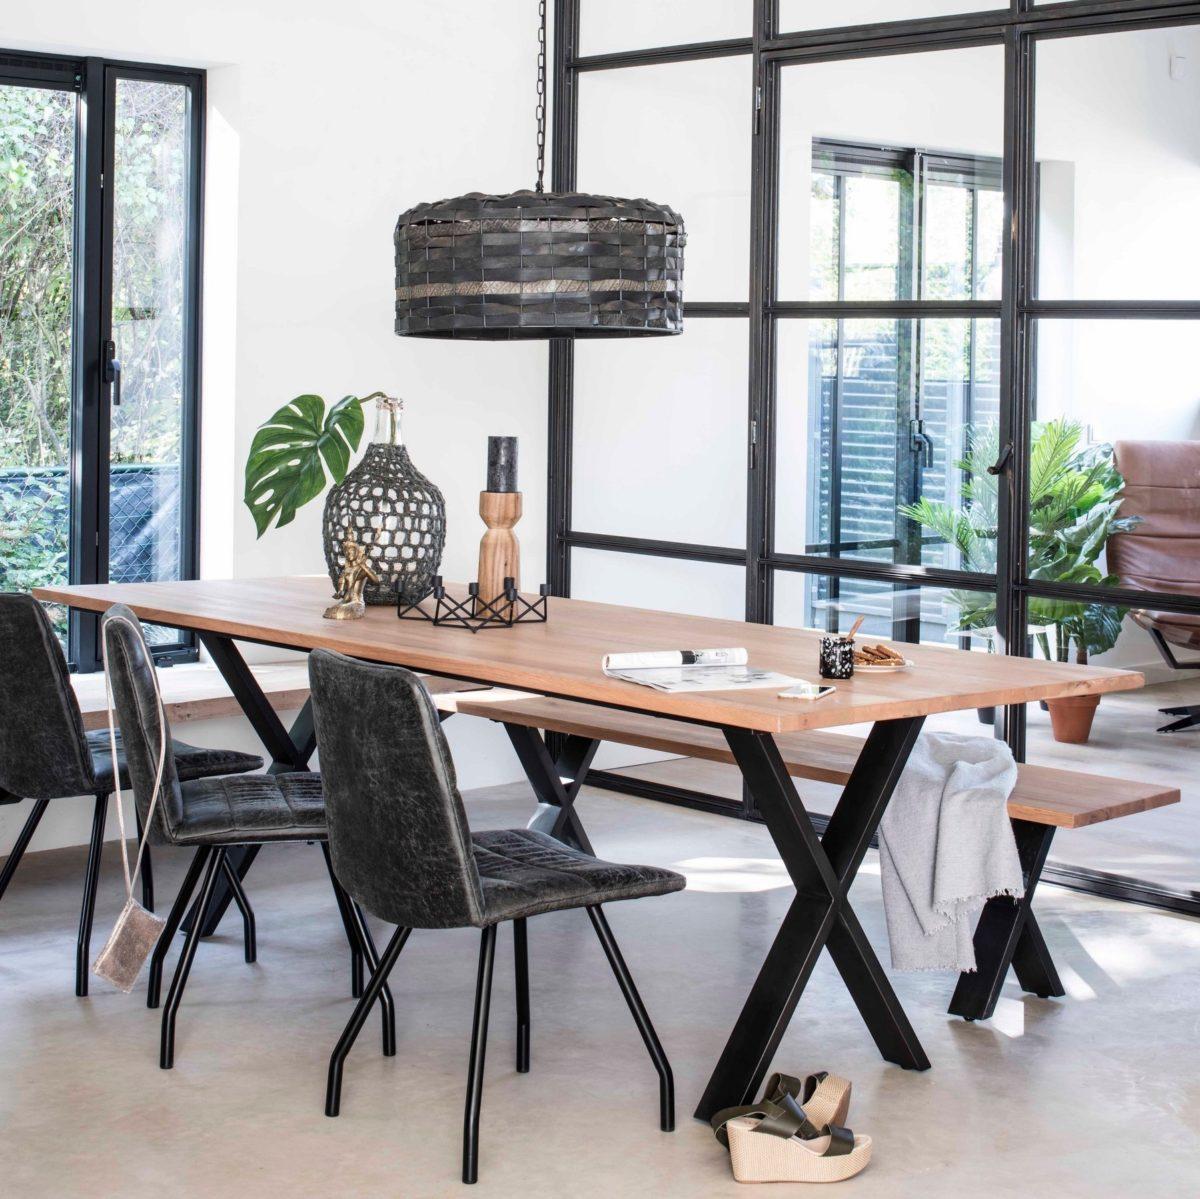 Xi dining table met Bandit